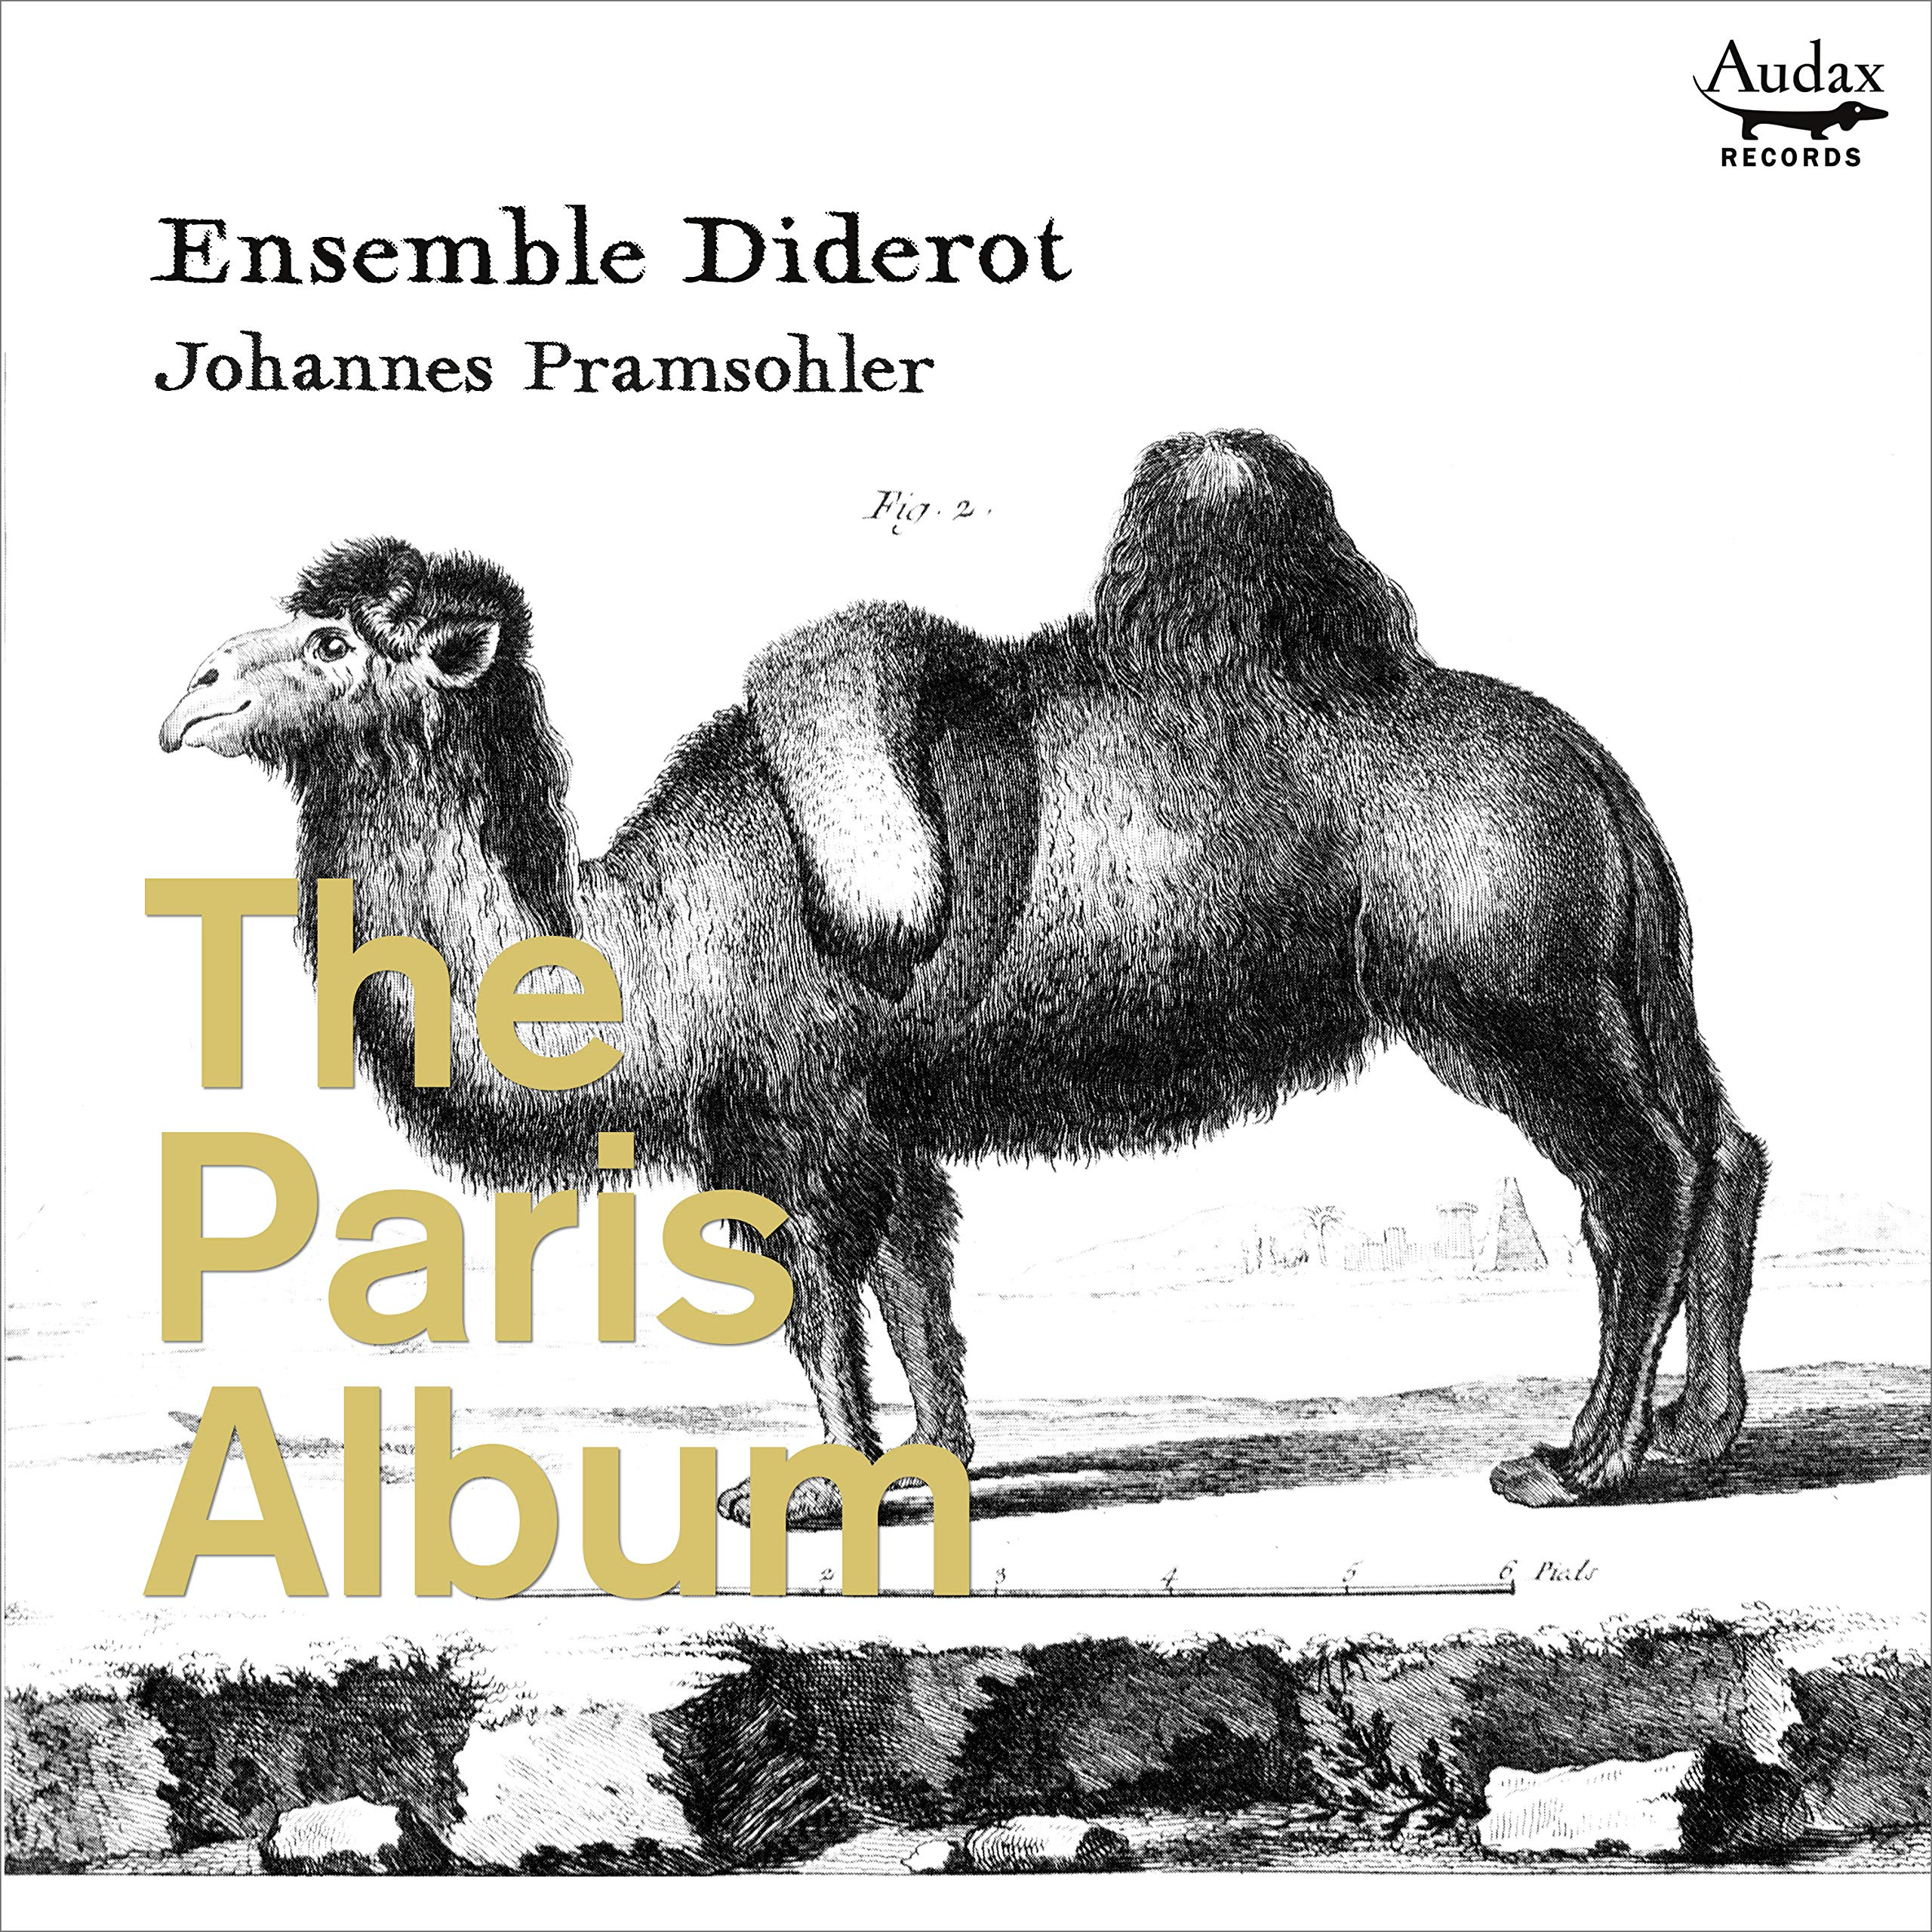 The Paris Album by AUDAX